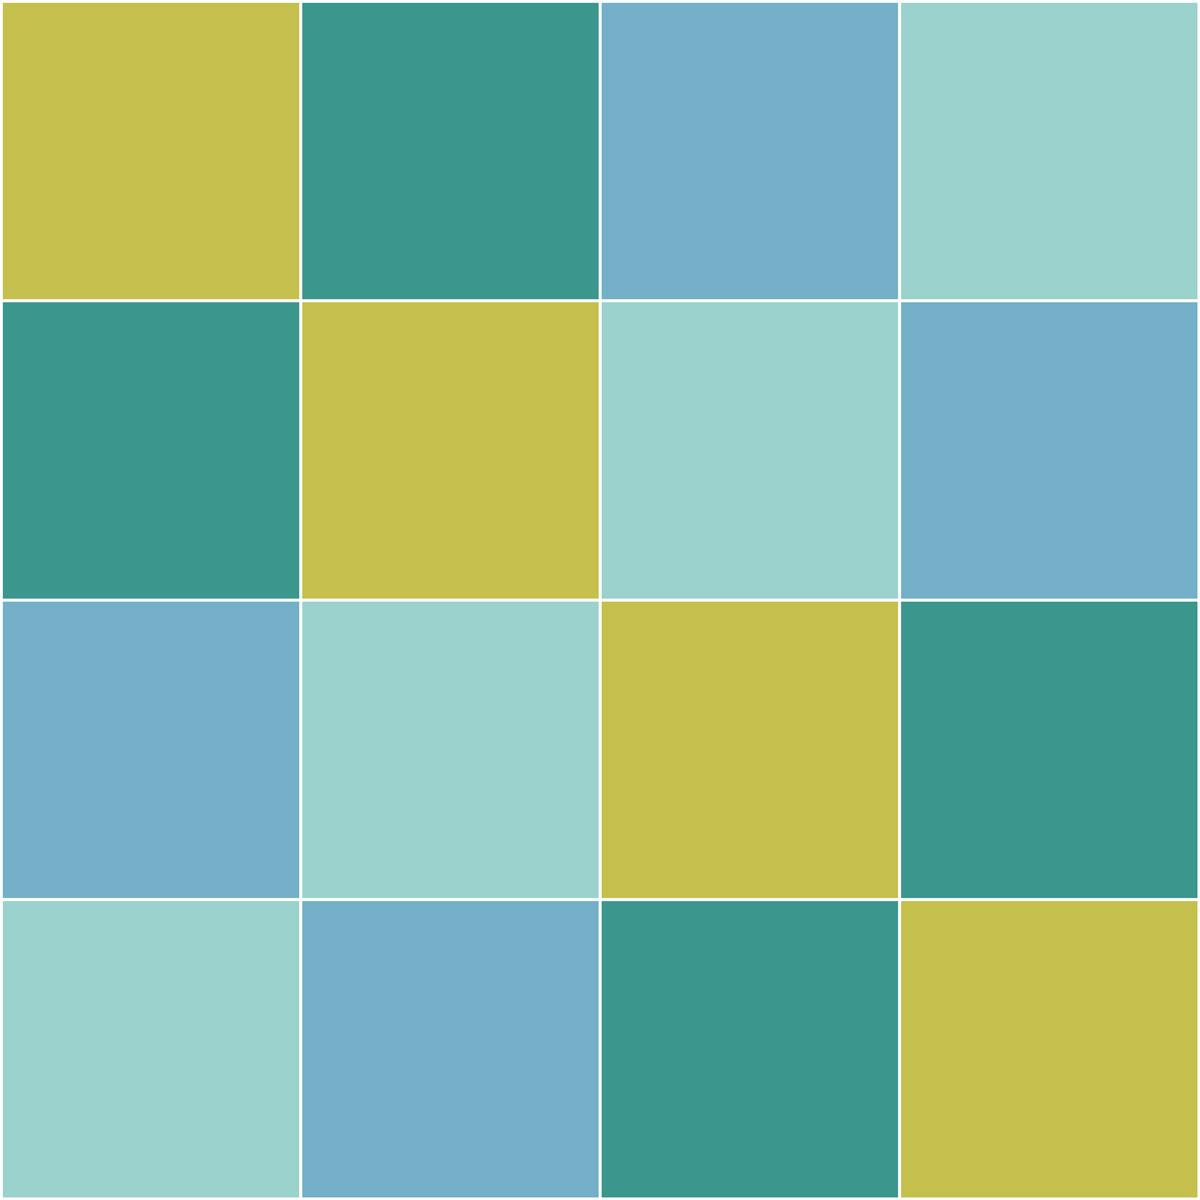 Four Square Variation 2